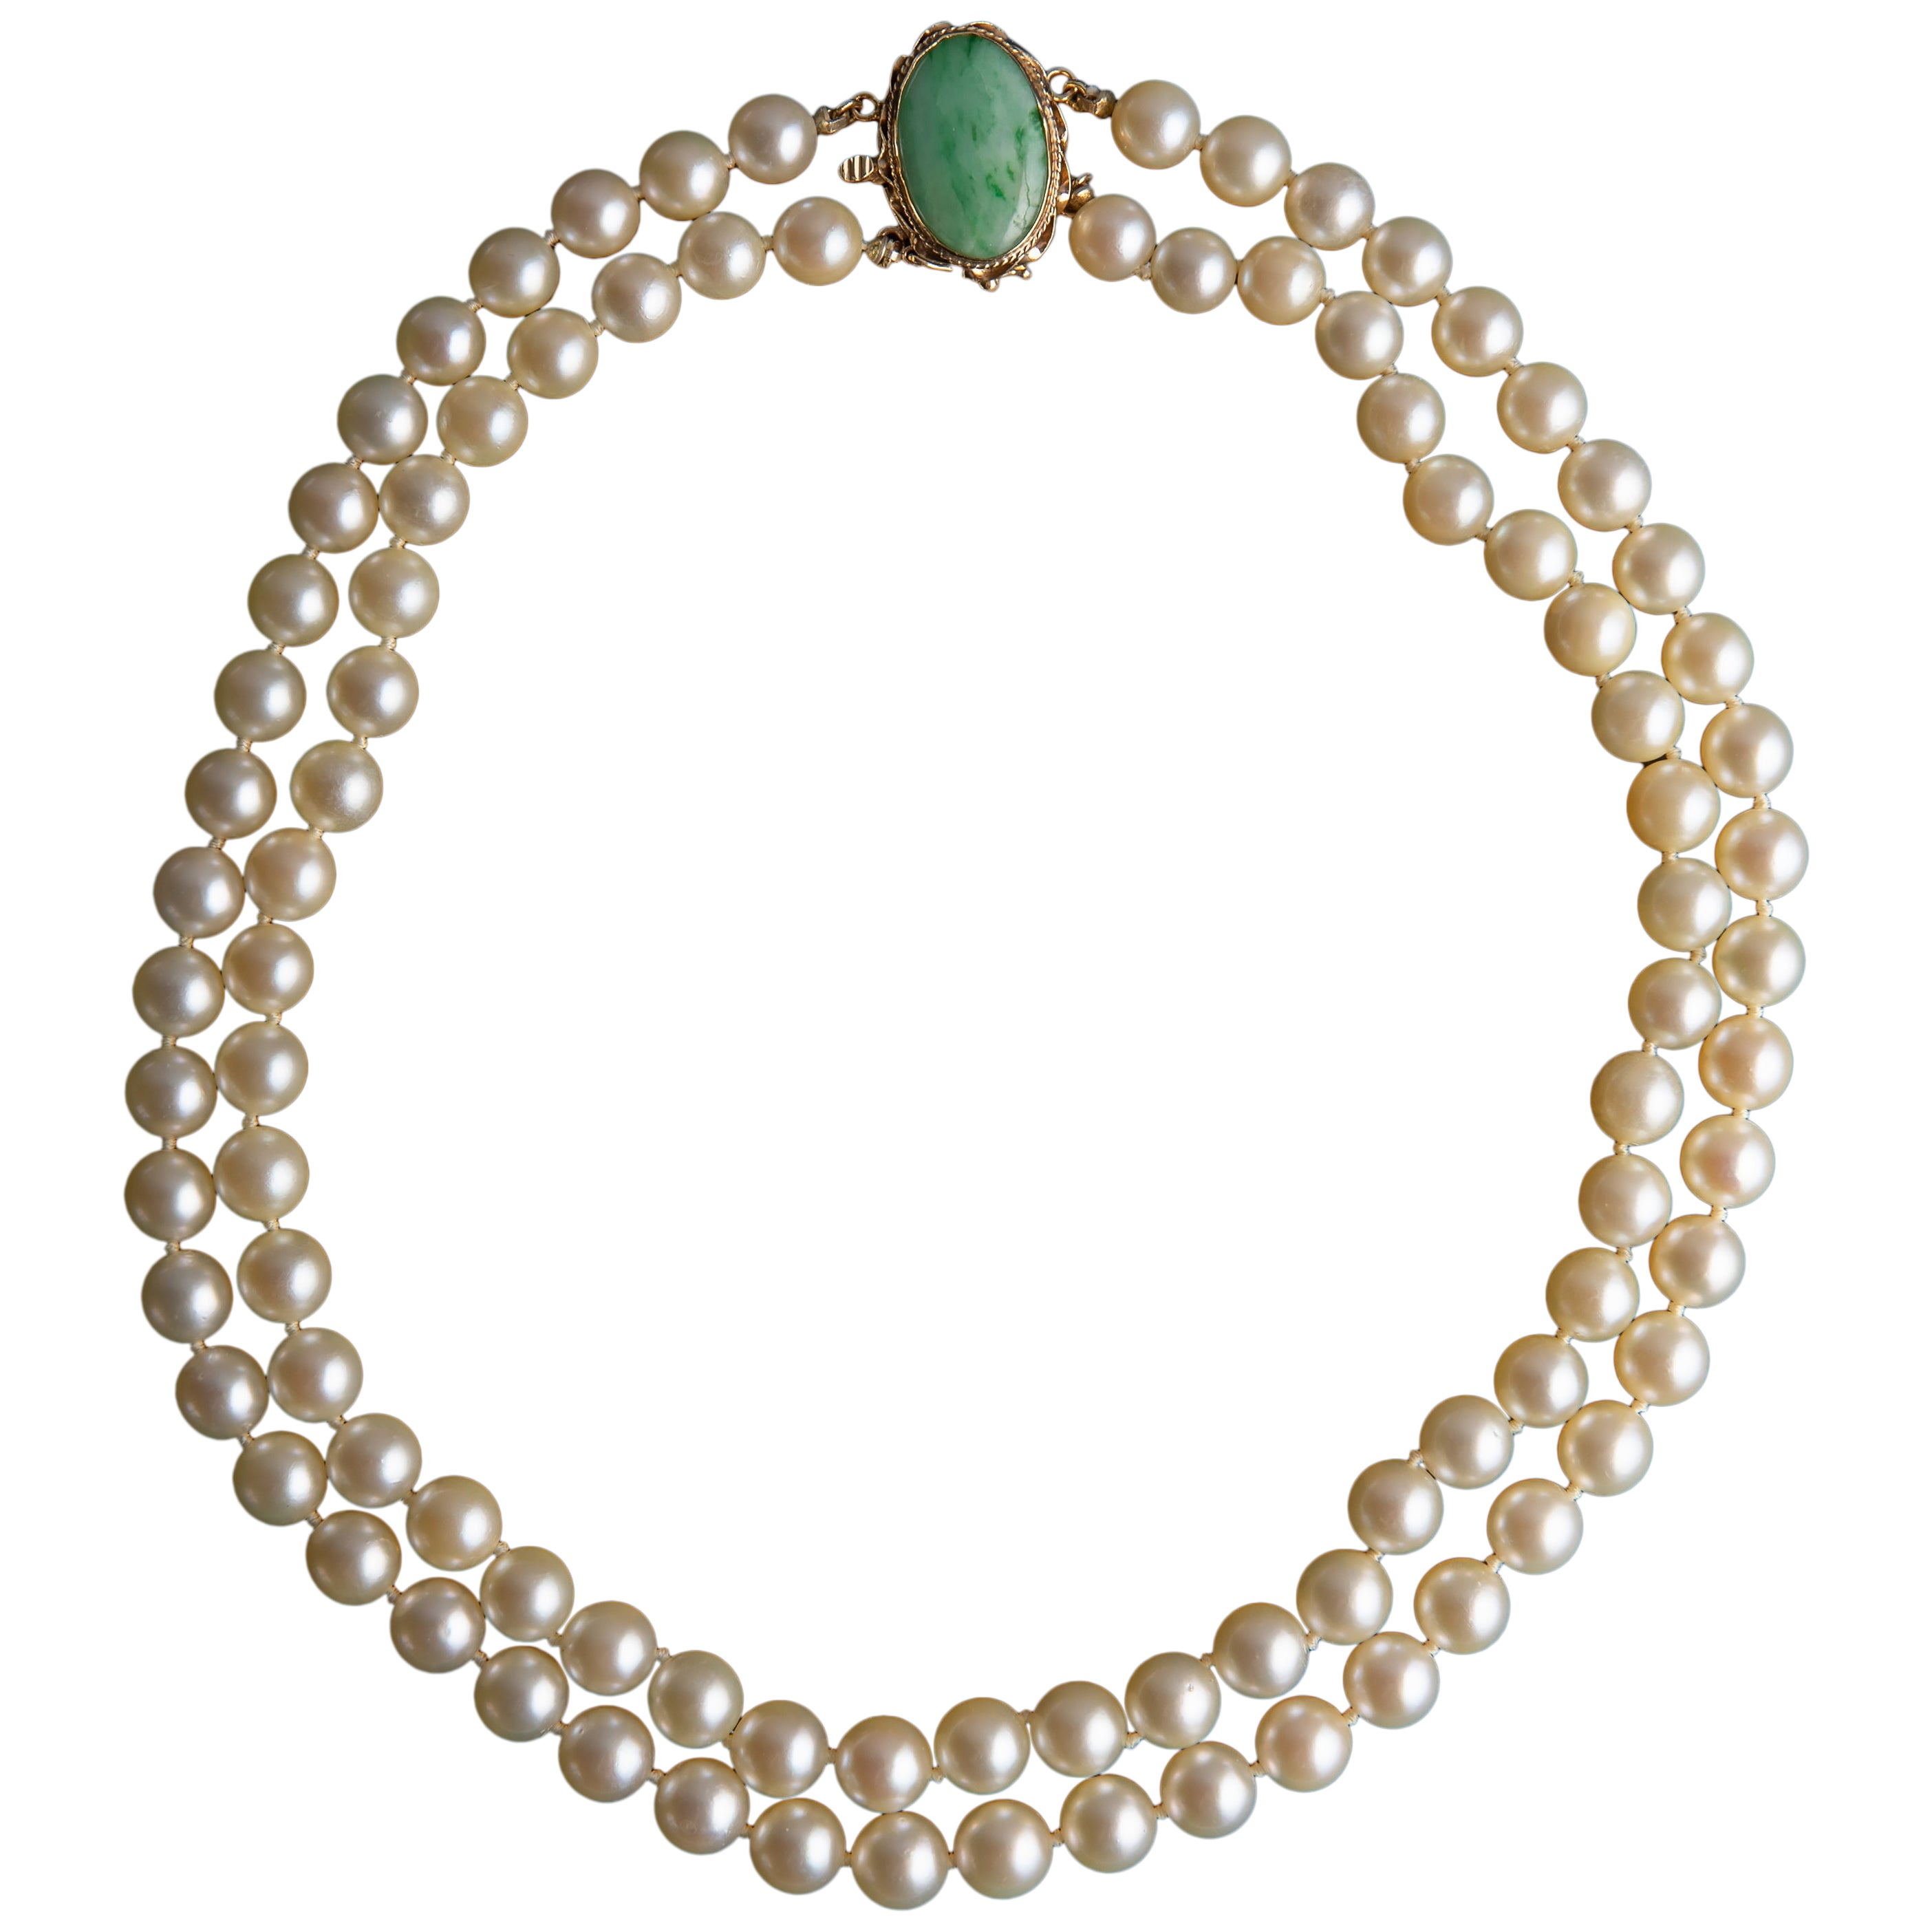 Akoya Pearl Necklace Double Strand Burmese Jadeite Clasp Certified